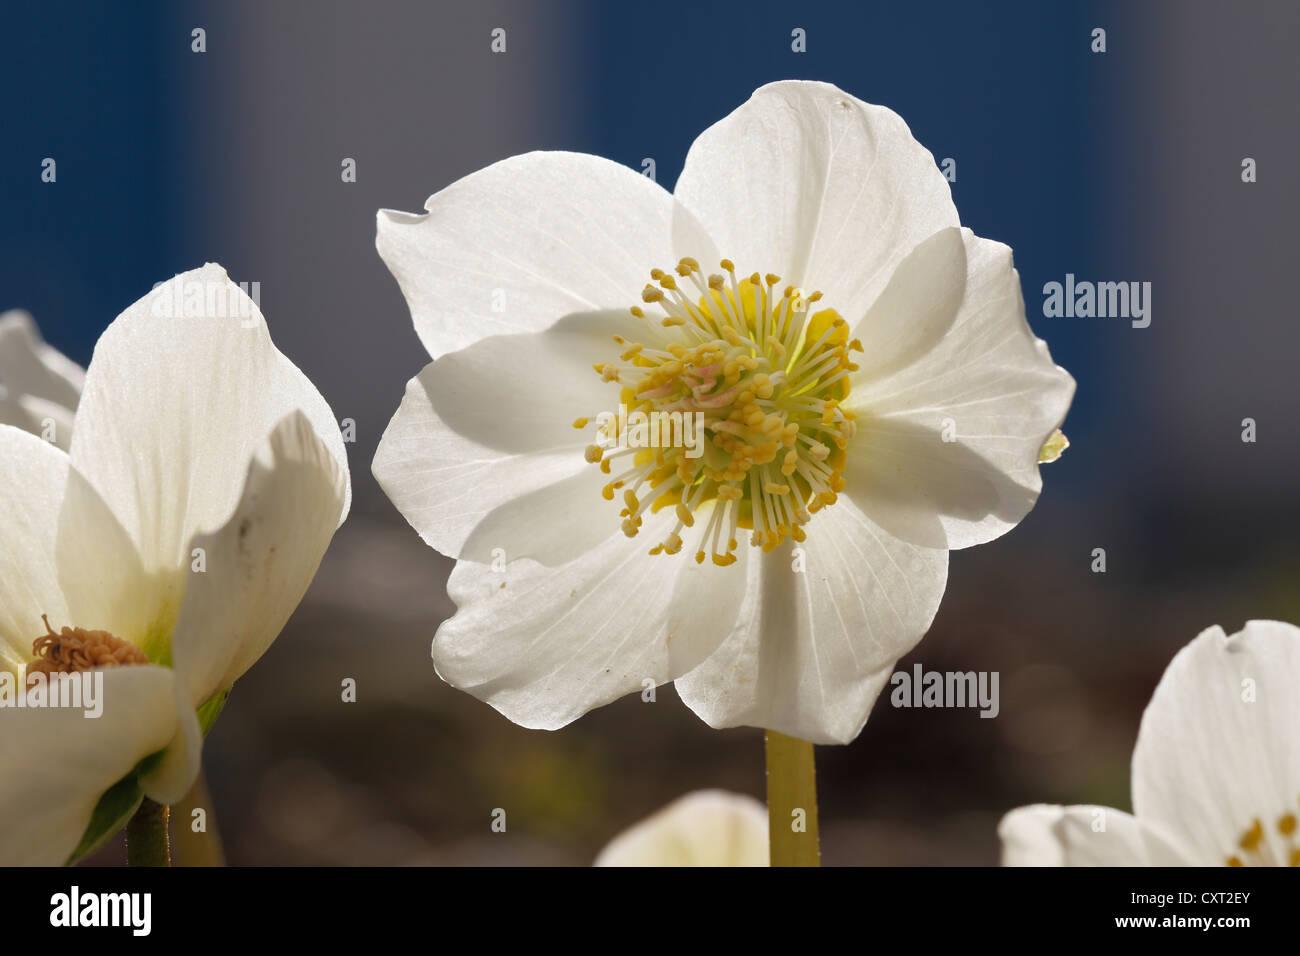 Christmas Rose or Black Hellebore (Helleborus niger), garden plant, Bavaria, Germany, Europe - Stock Image